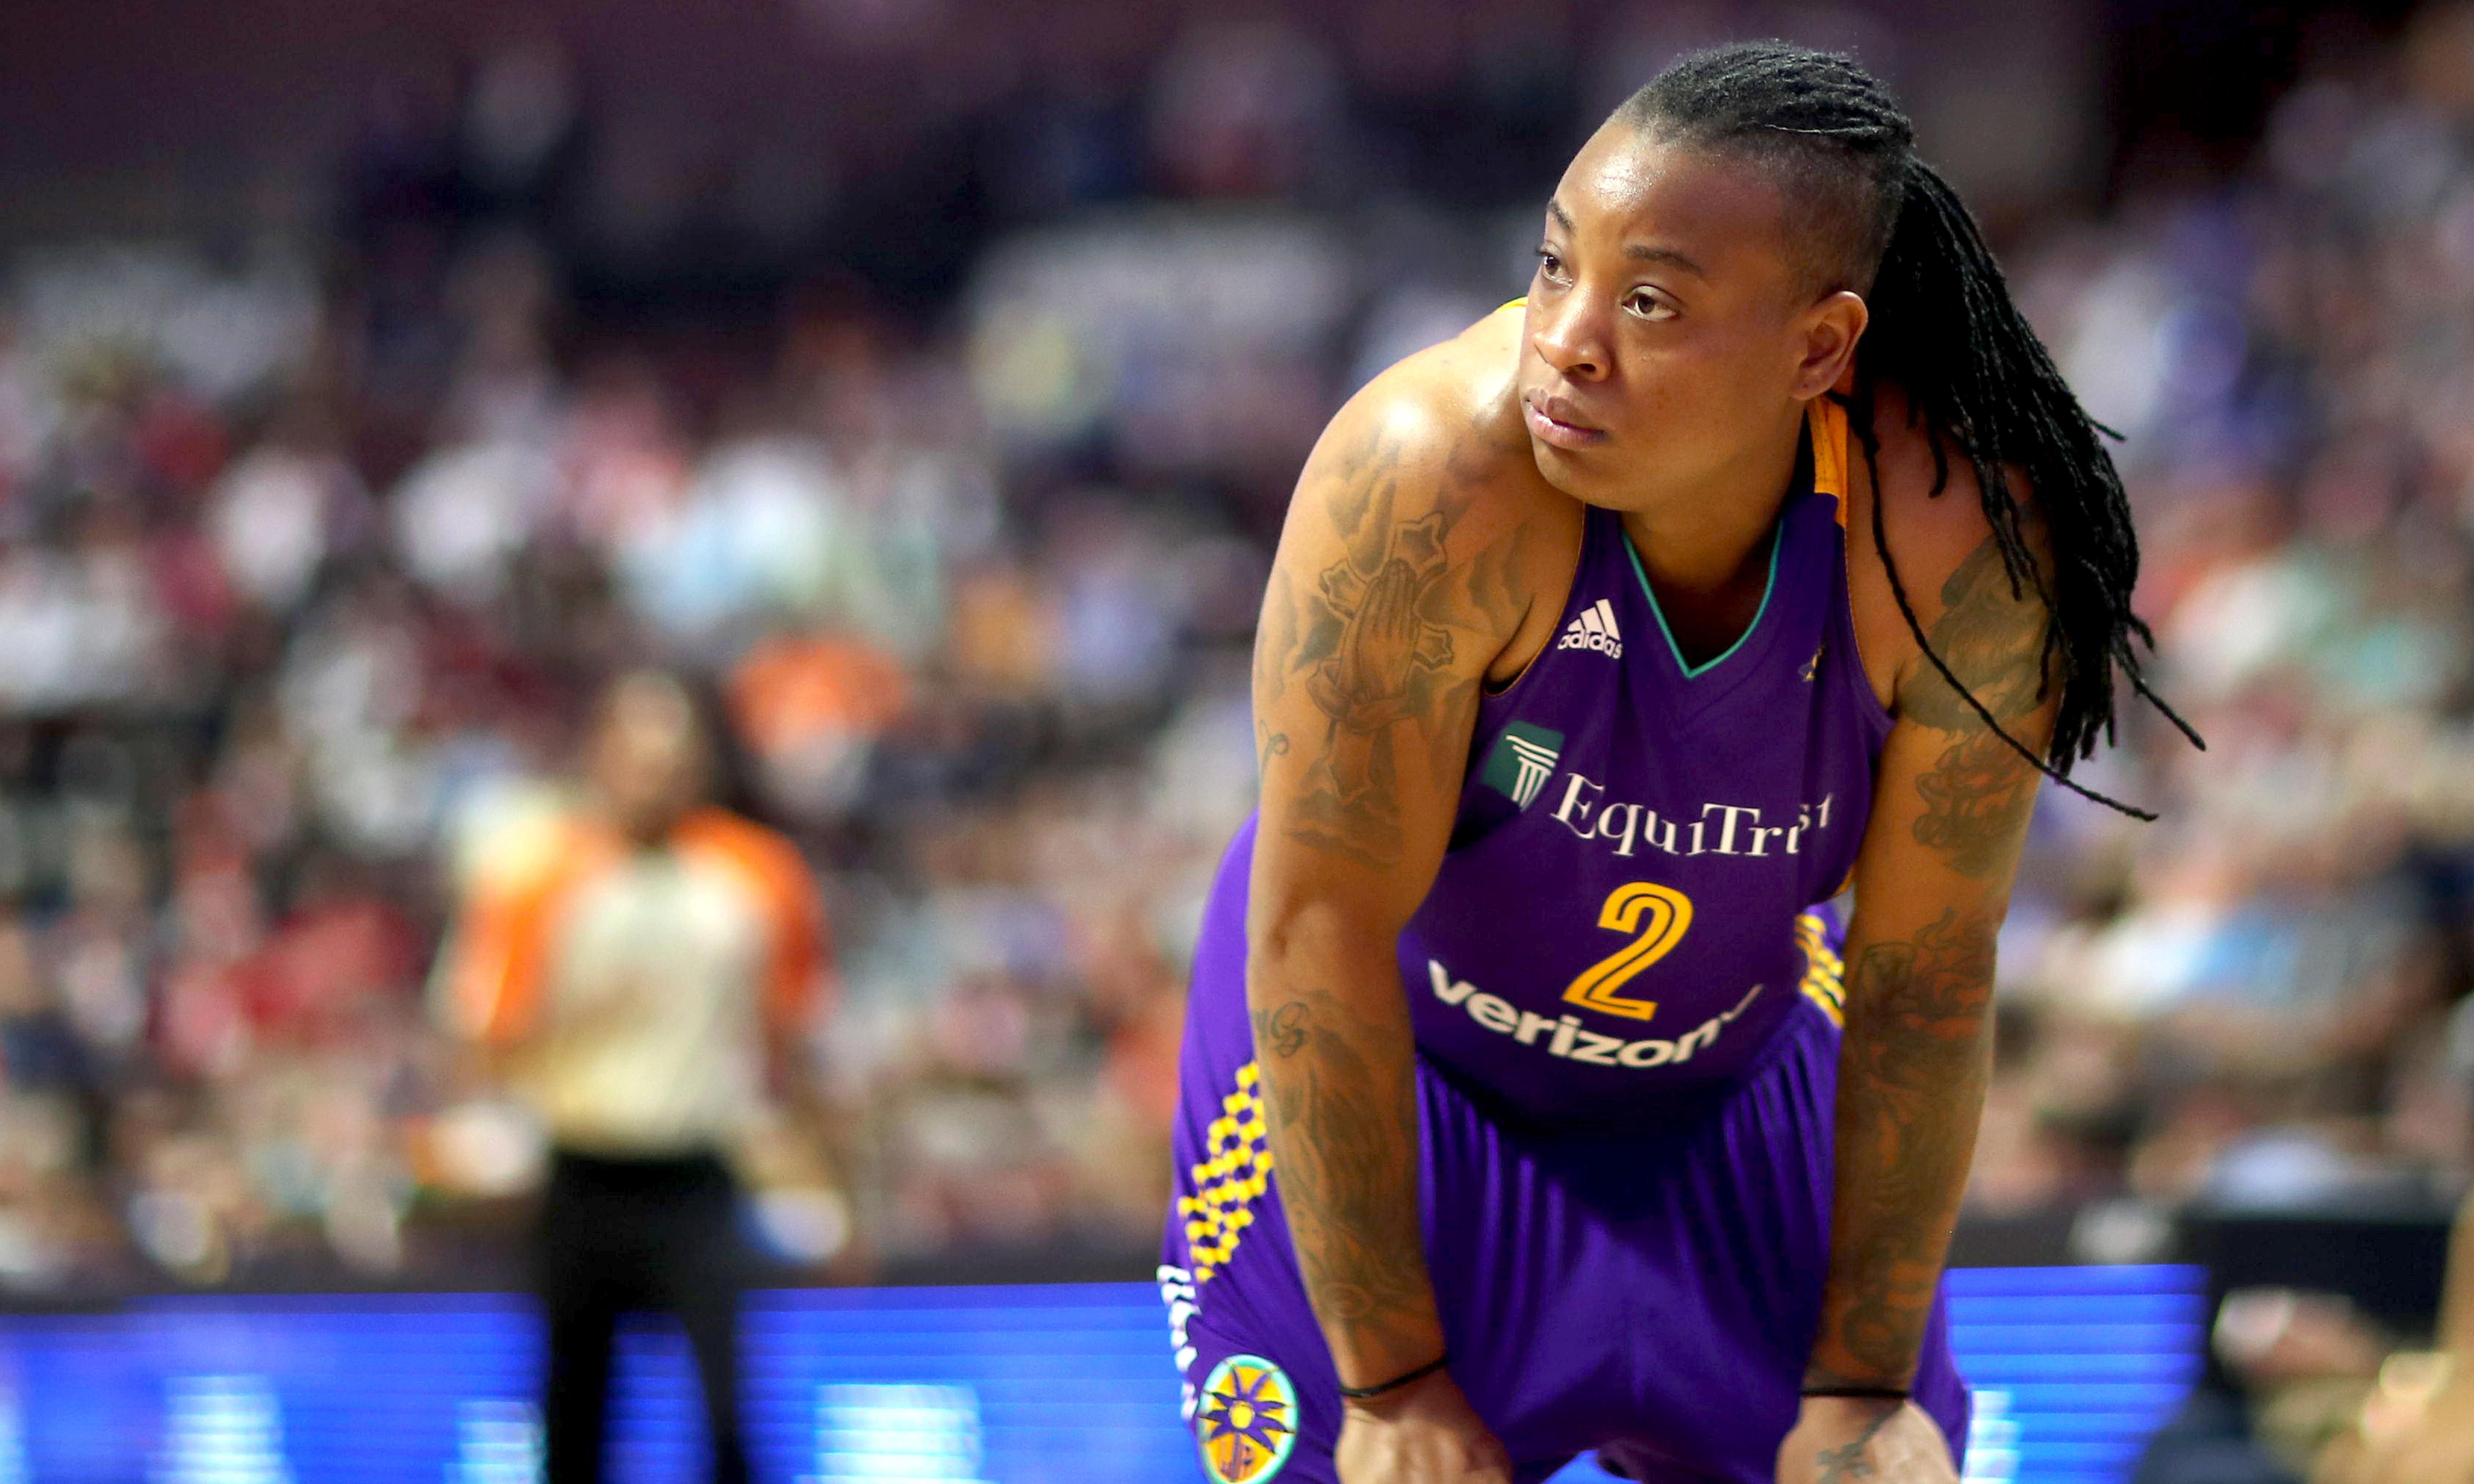 LA Sparks guard Riquna Williams suspended 10 games for domestic violence incident